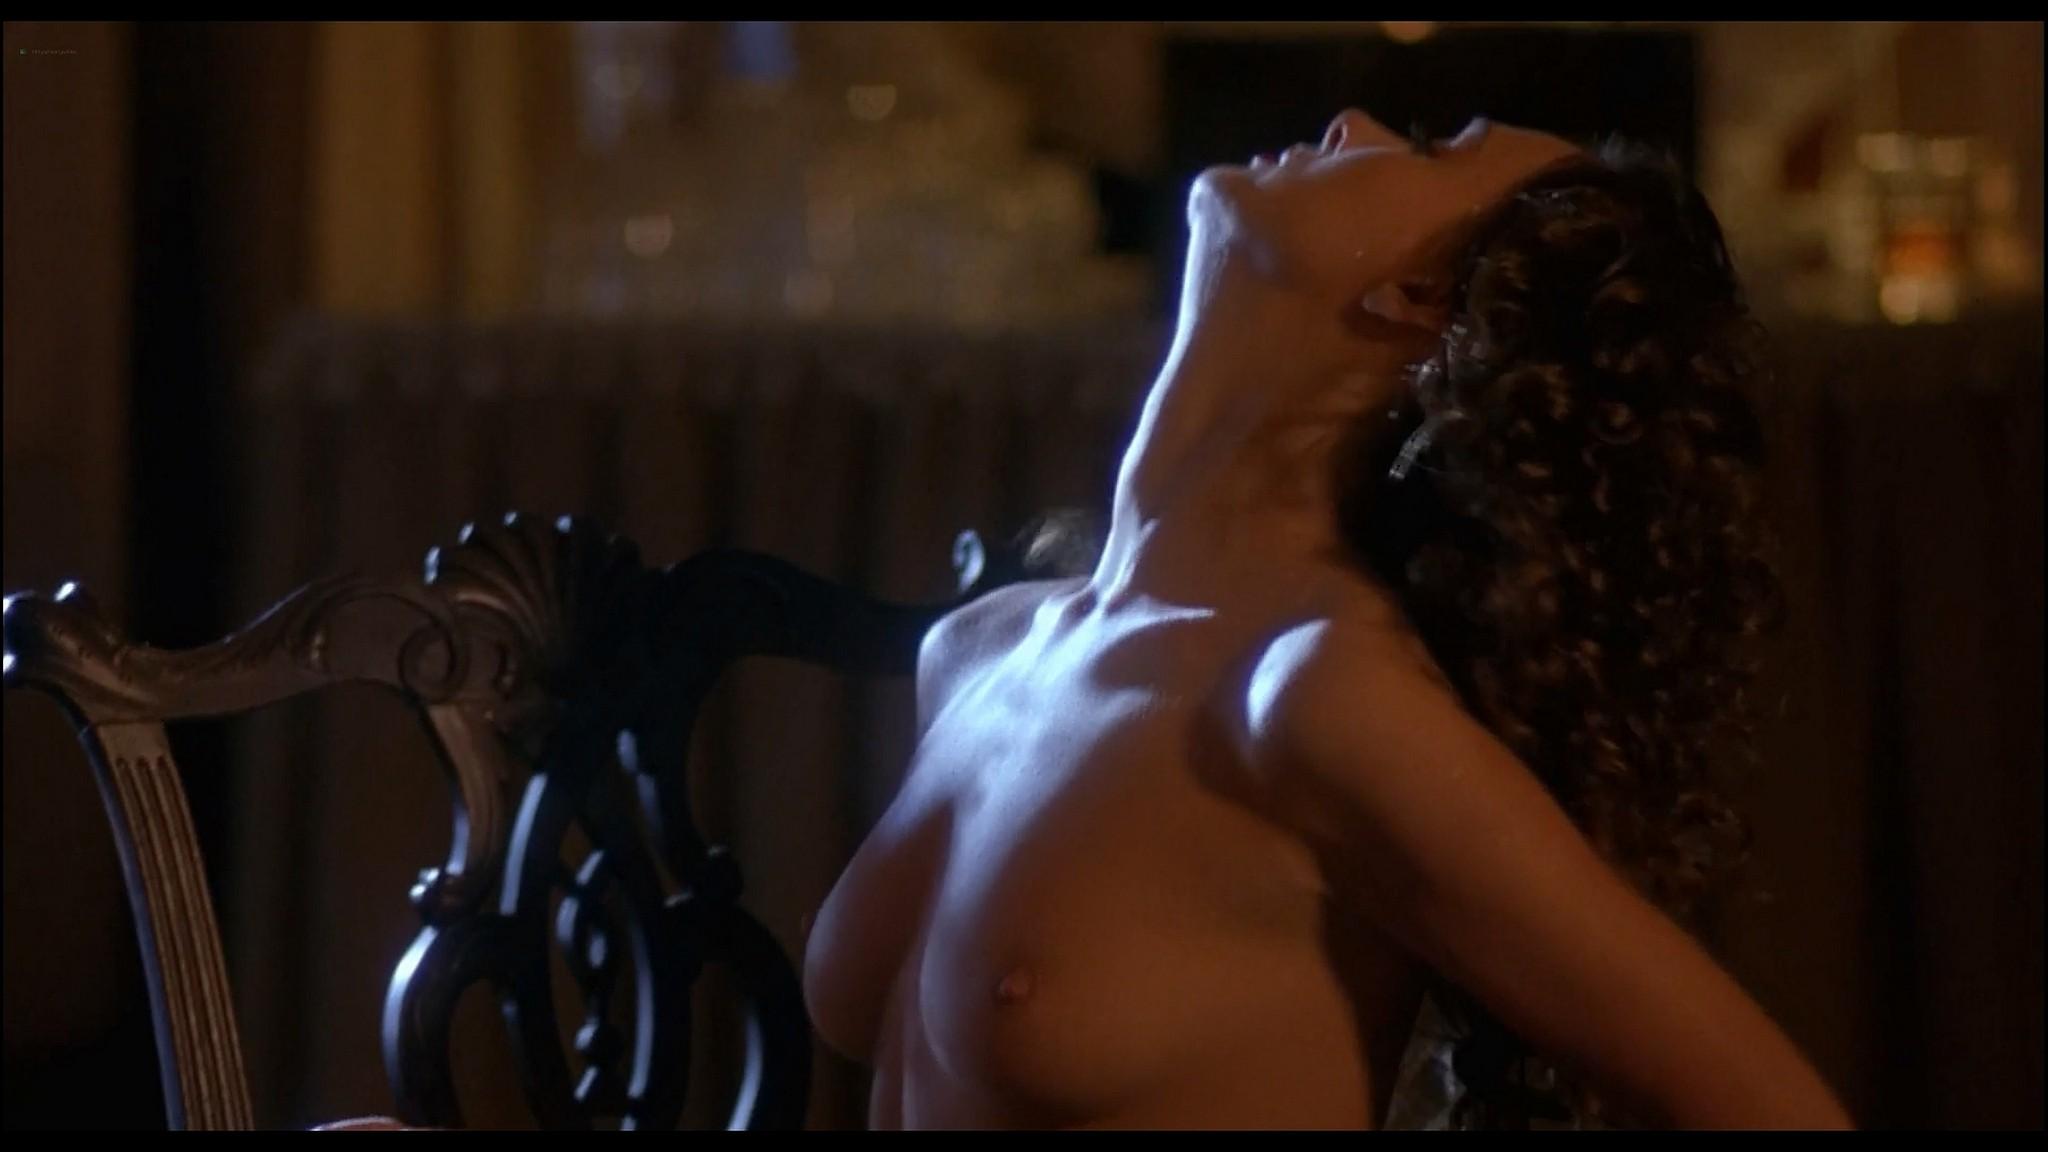 Nina Siemaszko nude sex Lydie Denier Gloria Reuben and others nude sex Wild Orchid 2 1992 1080p BluRay 6